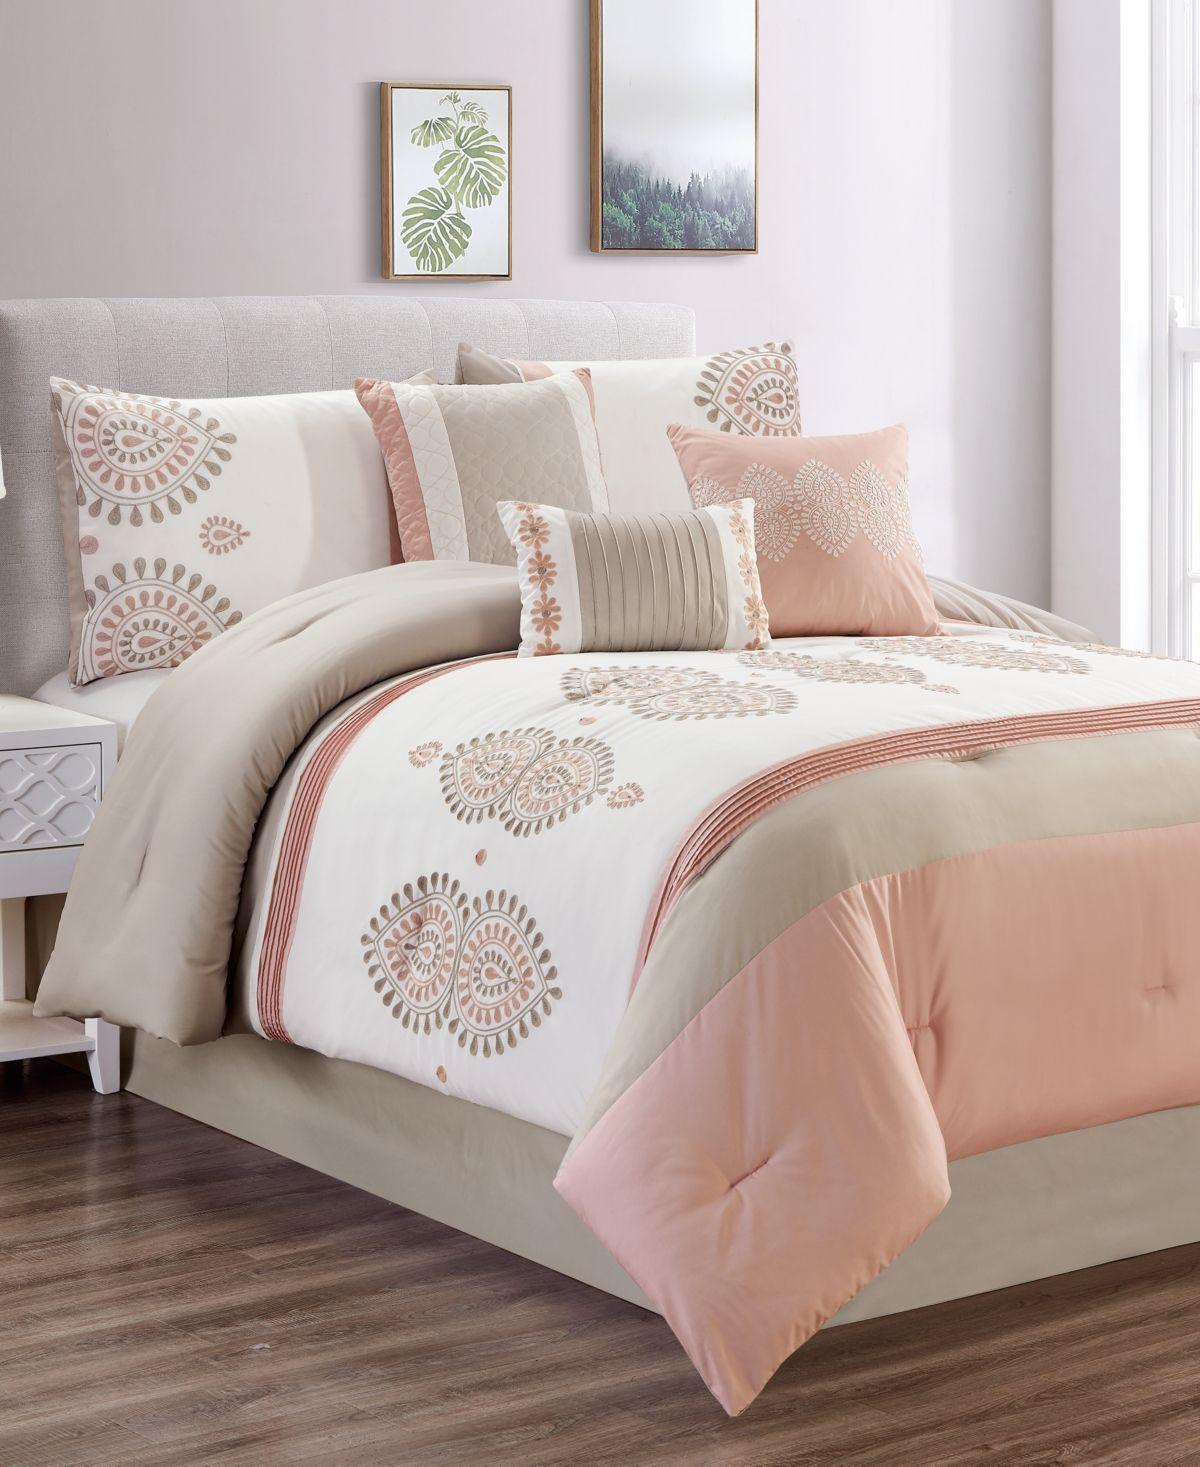 Closeout 7 Pc California King Comforter Set Blush Taupe Comforter Sets Full Comforter Sets Comforters